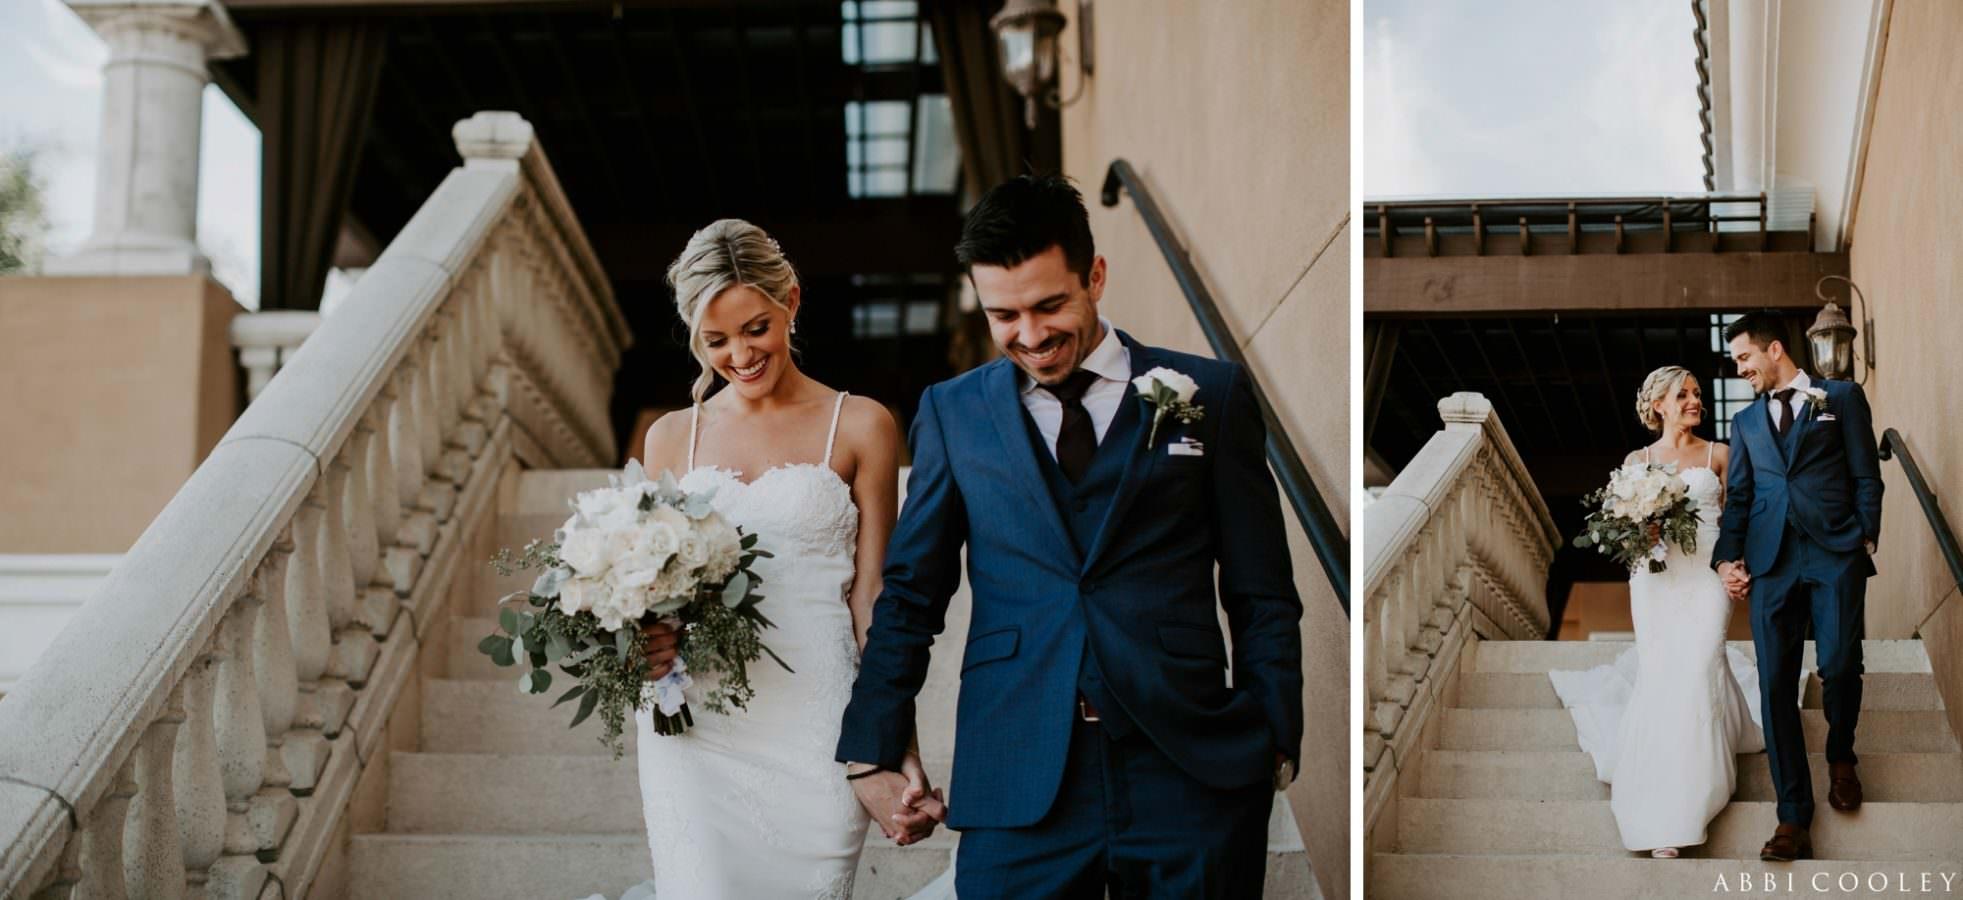 ABBI COOLEY WILSON CREEK WINERY TEMECULA WEDDING_0855